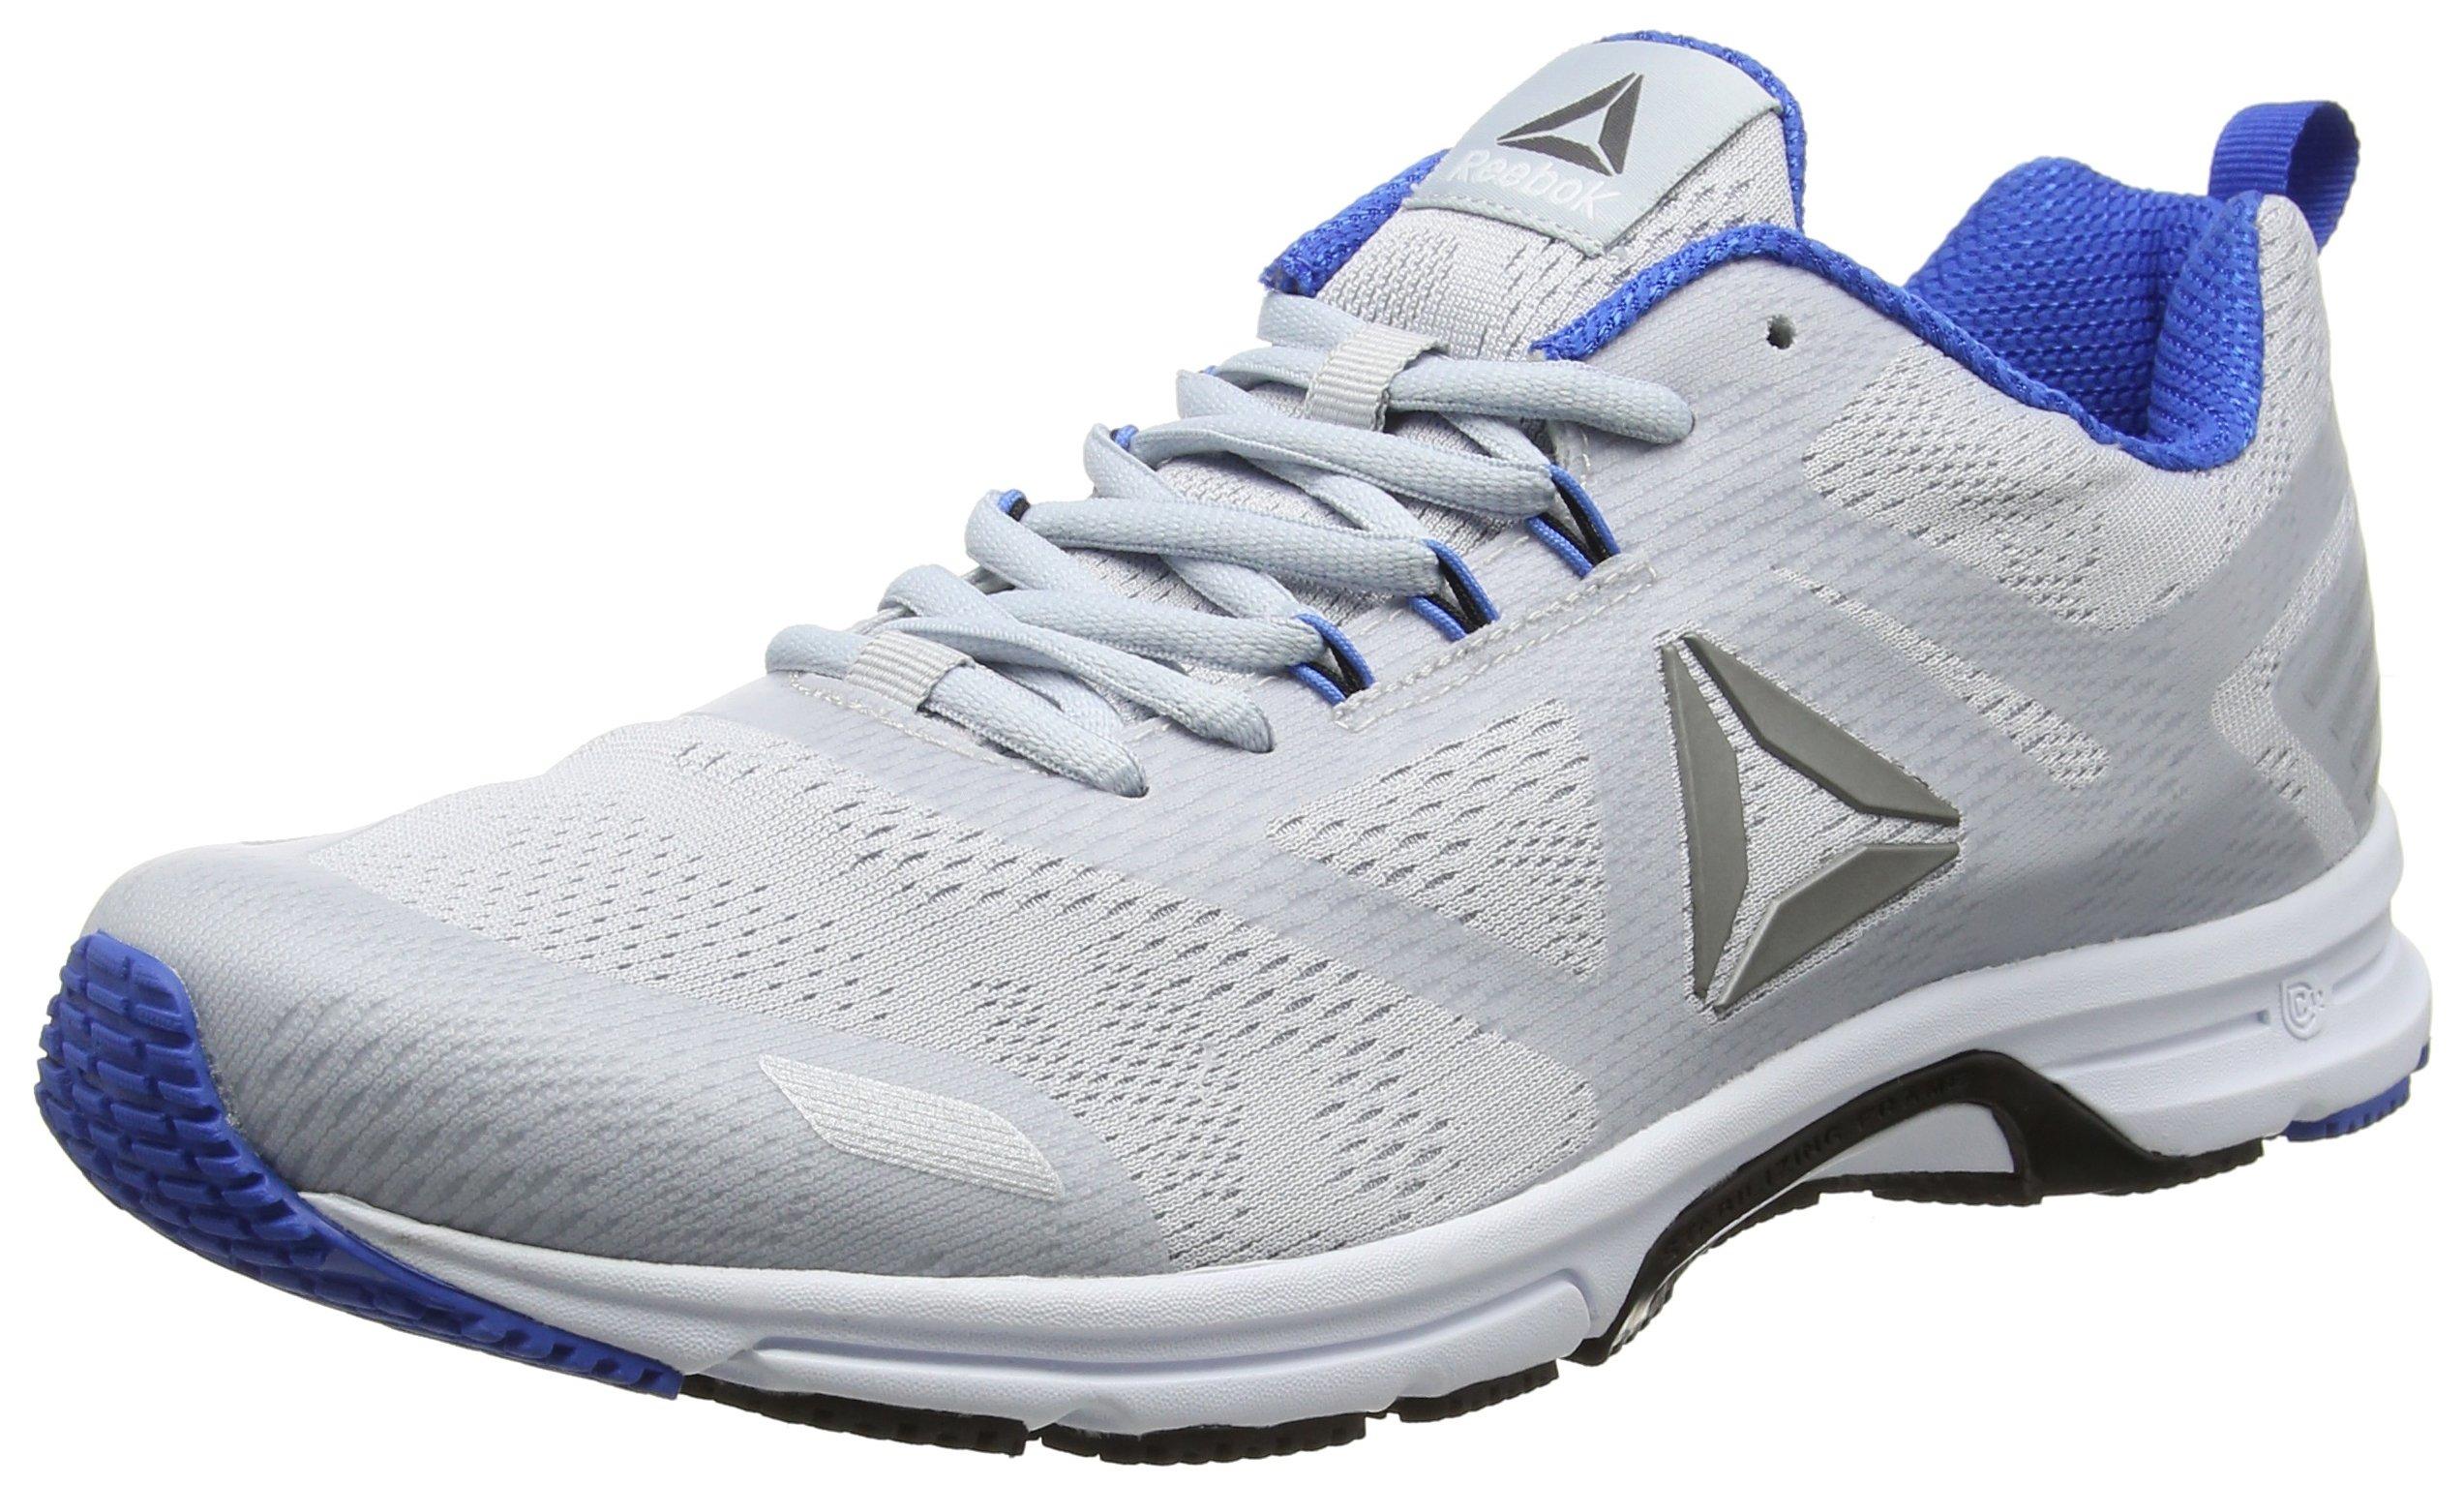 Reebok Men's Ahary Runner Running Shoes